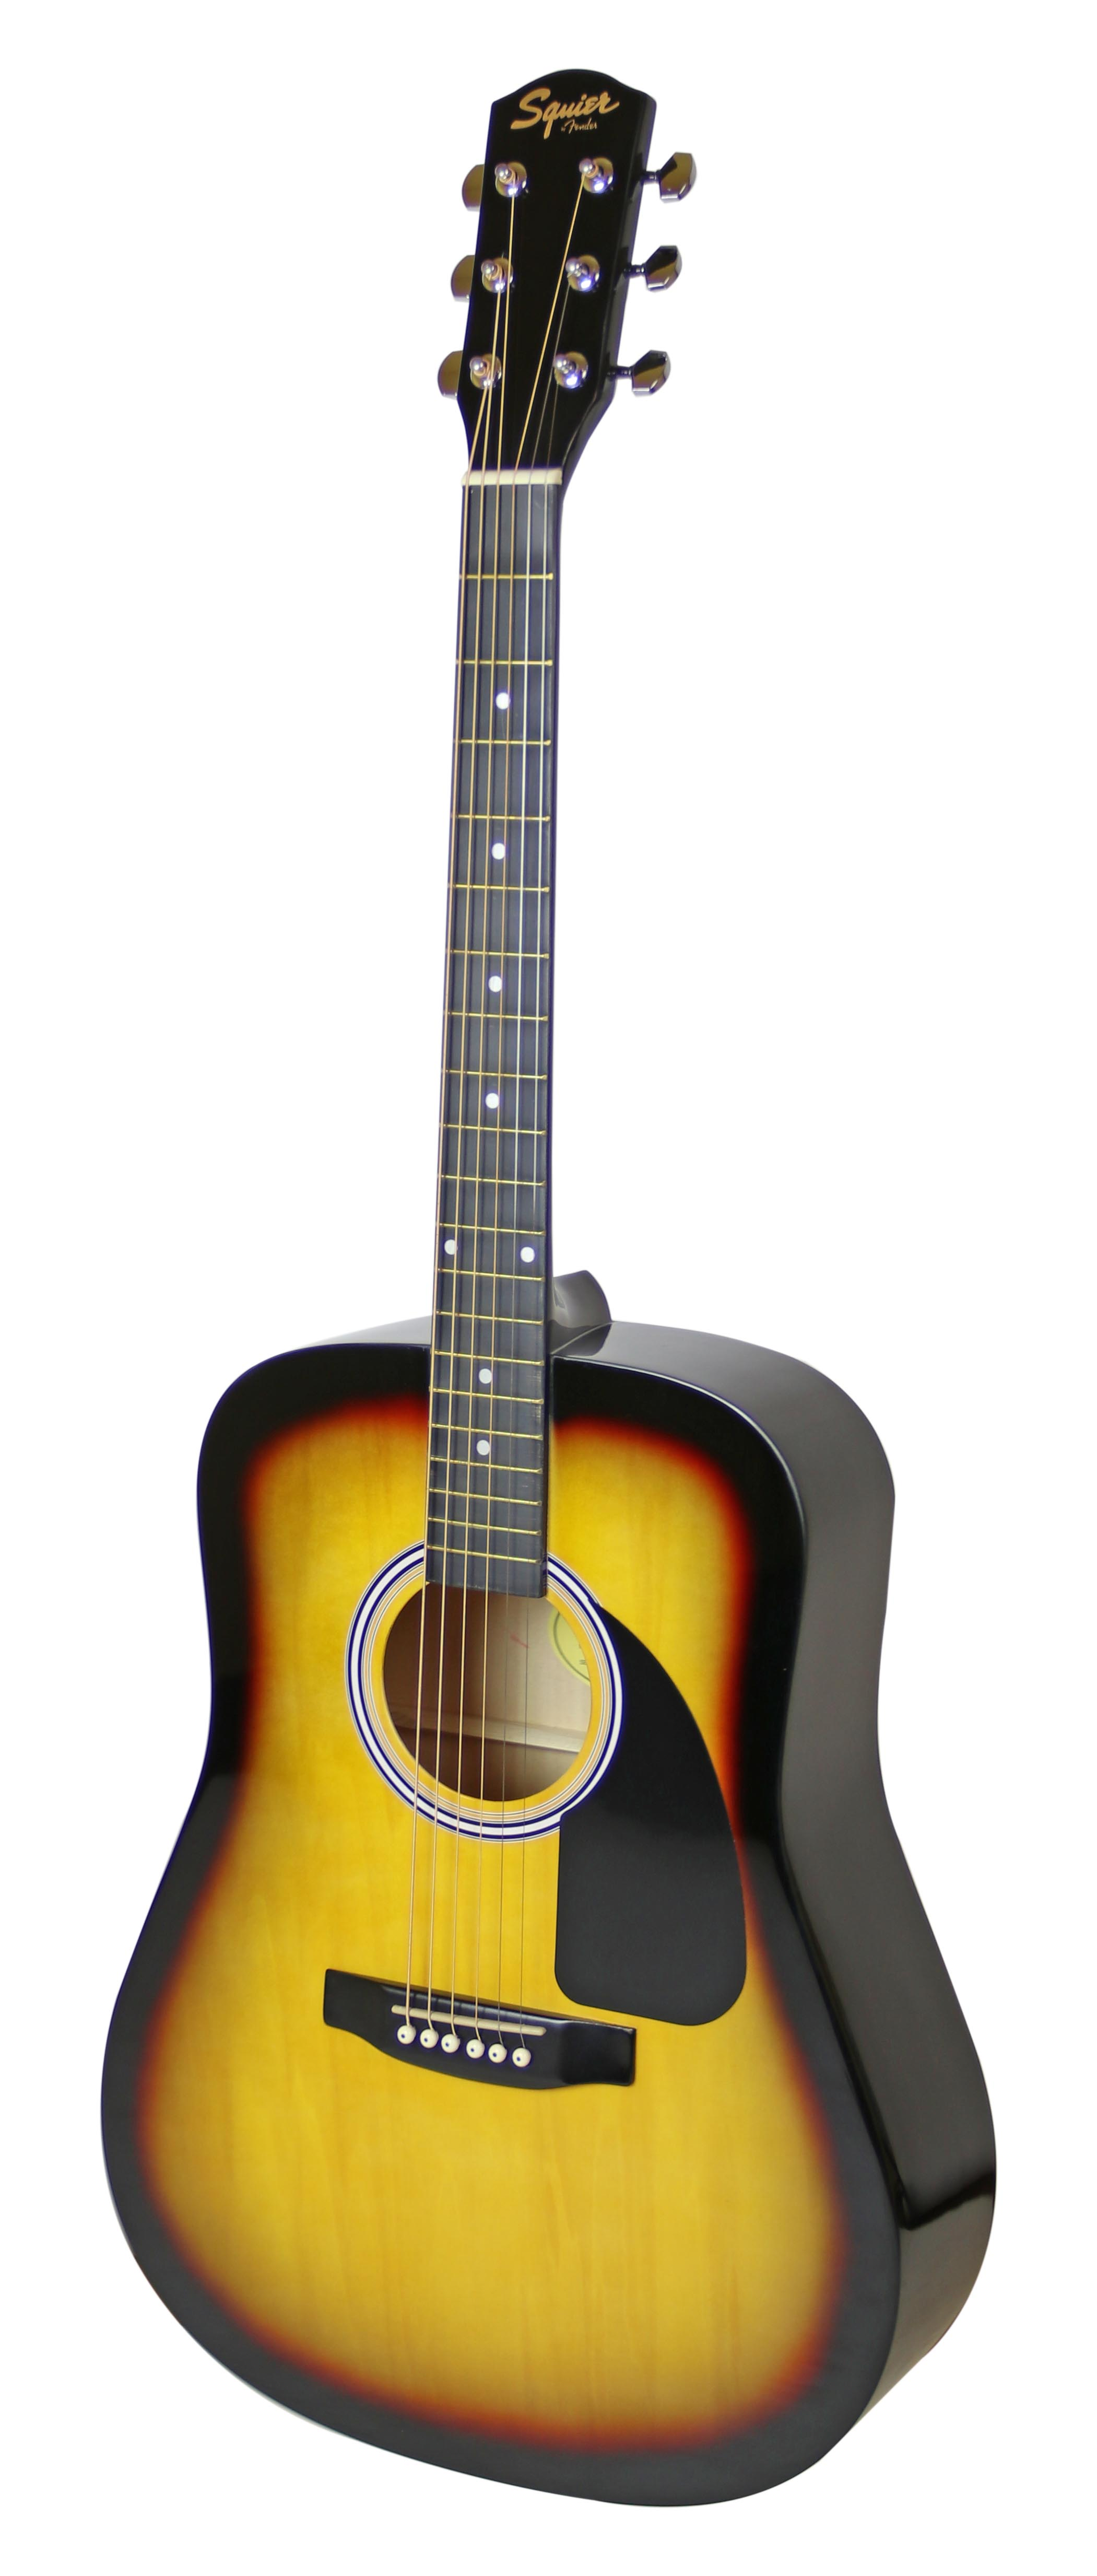 squier by fender sa 150 dreadnought acoustic guitar sunburst 885978857371 ebay. Black Bedroom Furniture Sets. Home Design Ideas